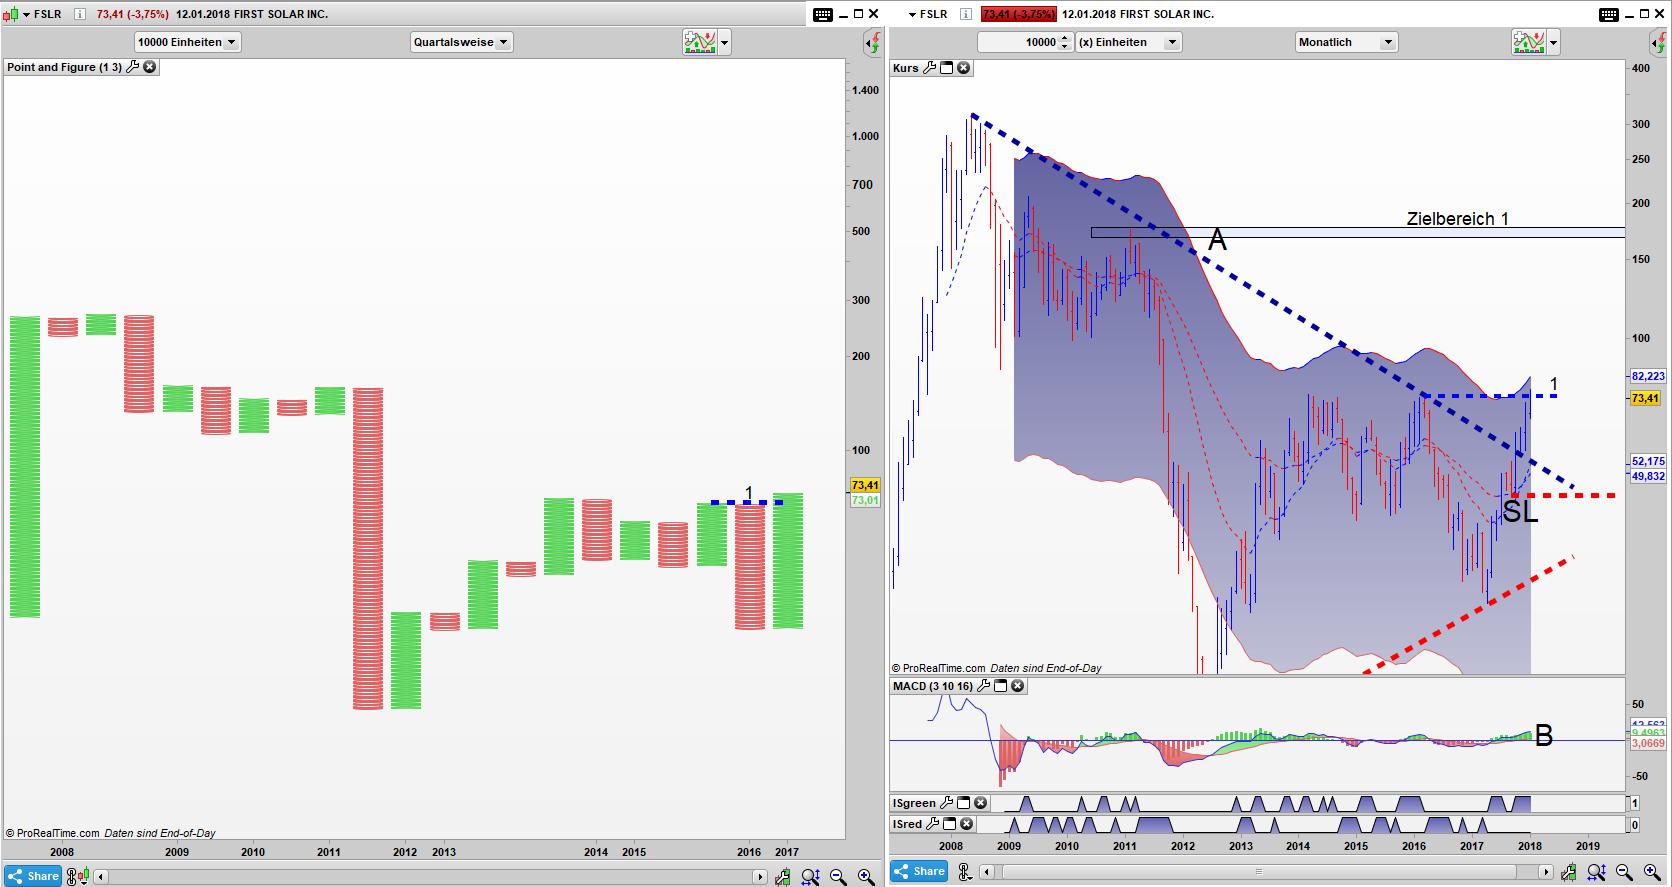 FSLR Point and Figure Quartals Chart, Bar Monats Chart: Die Ablauflinie wurde getriggert